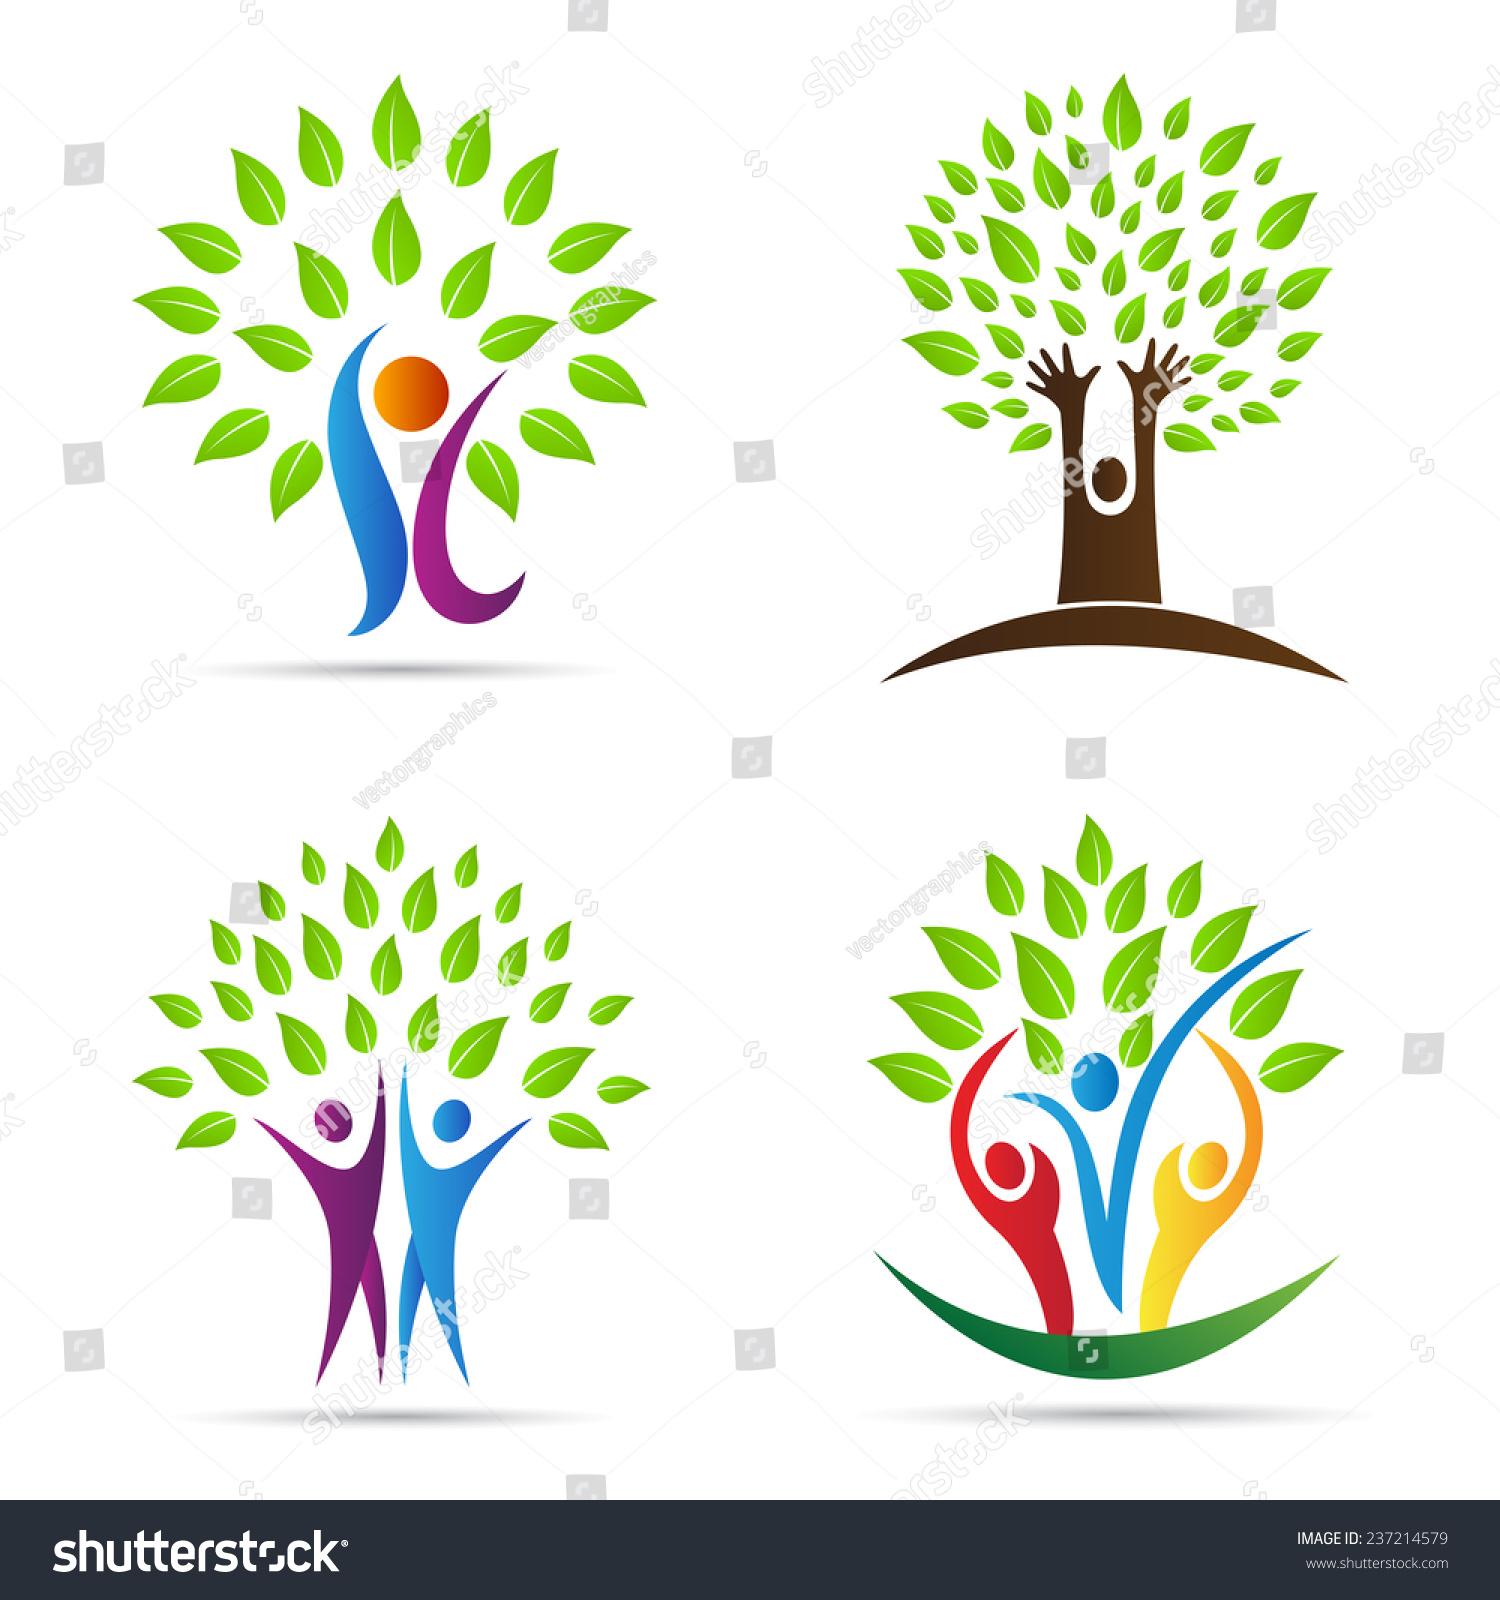 Abstract Tree Vector Design Represents Eco Stock Vector 237214579 ...